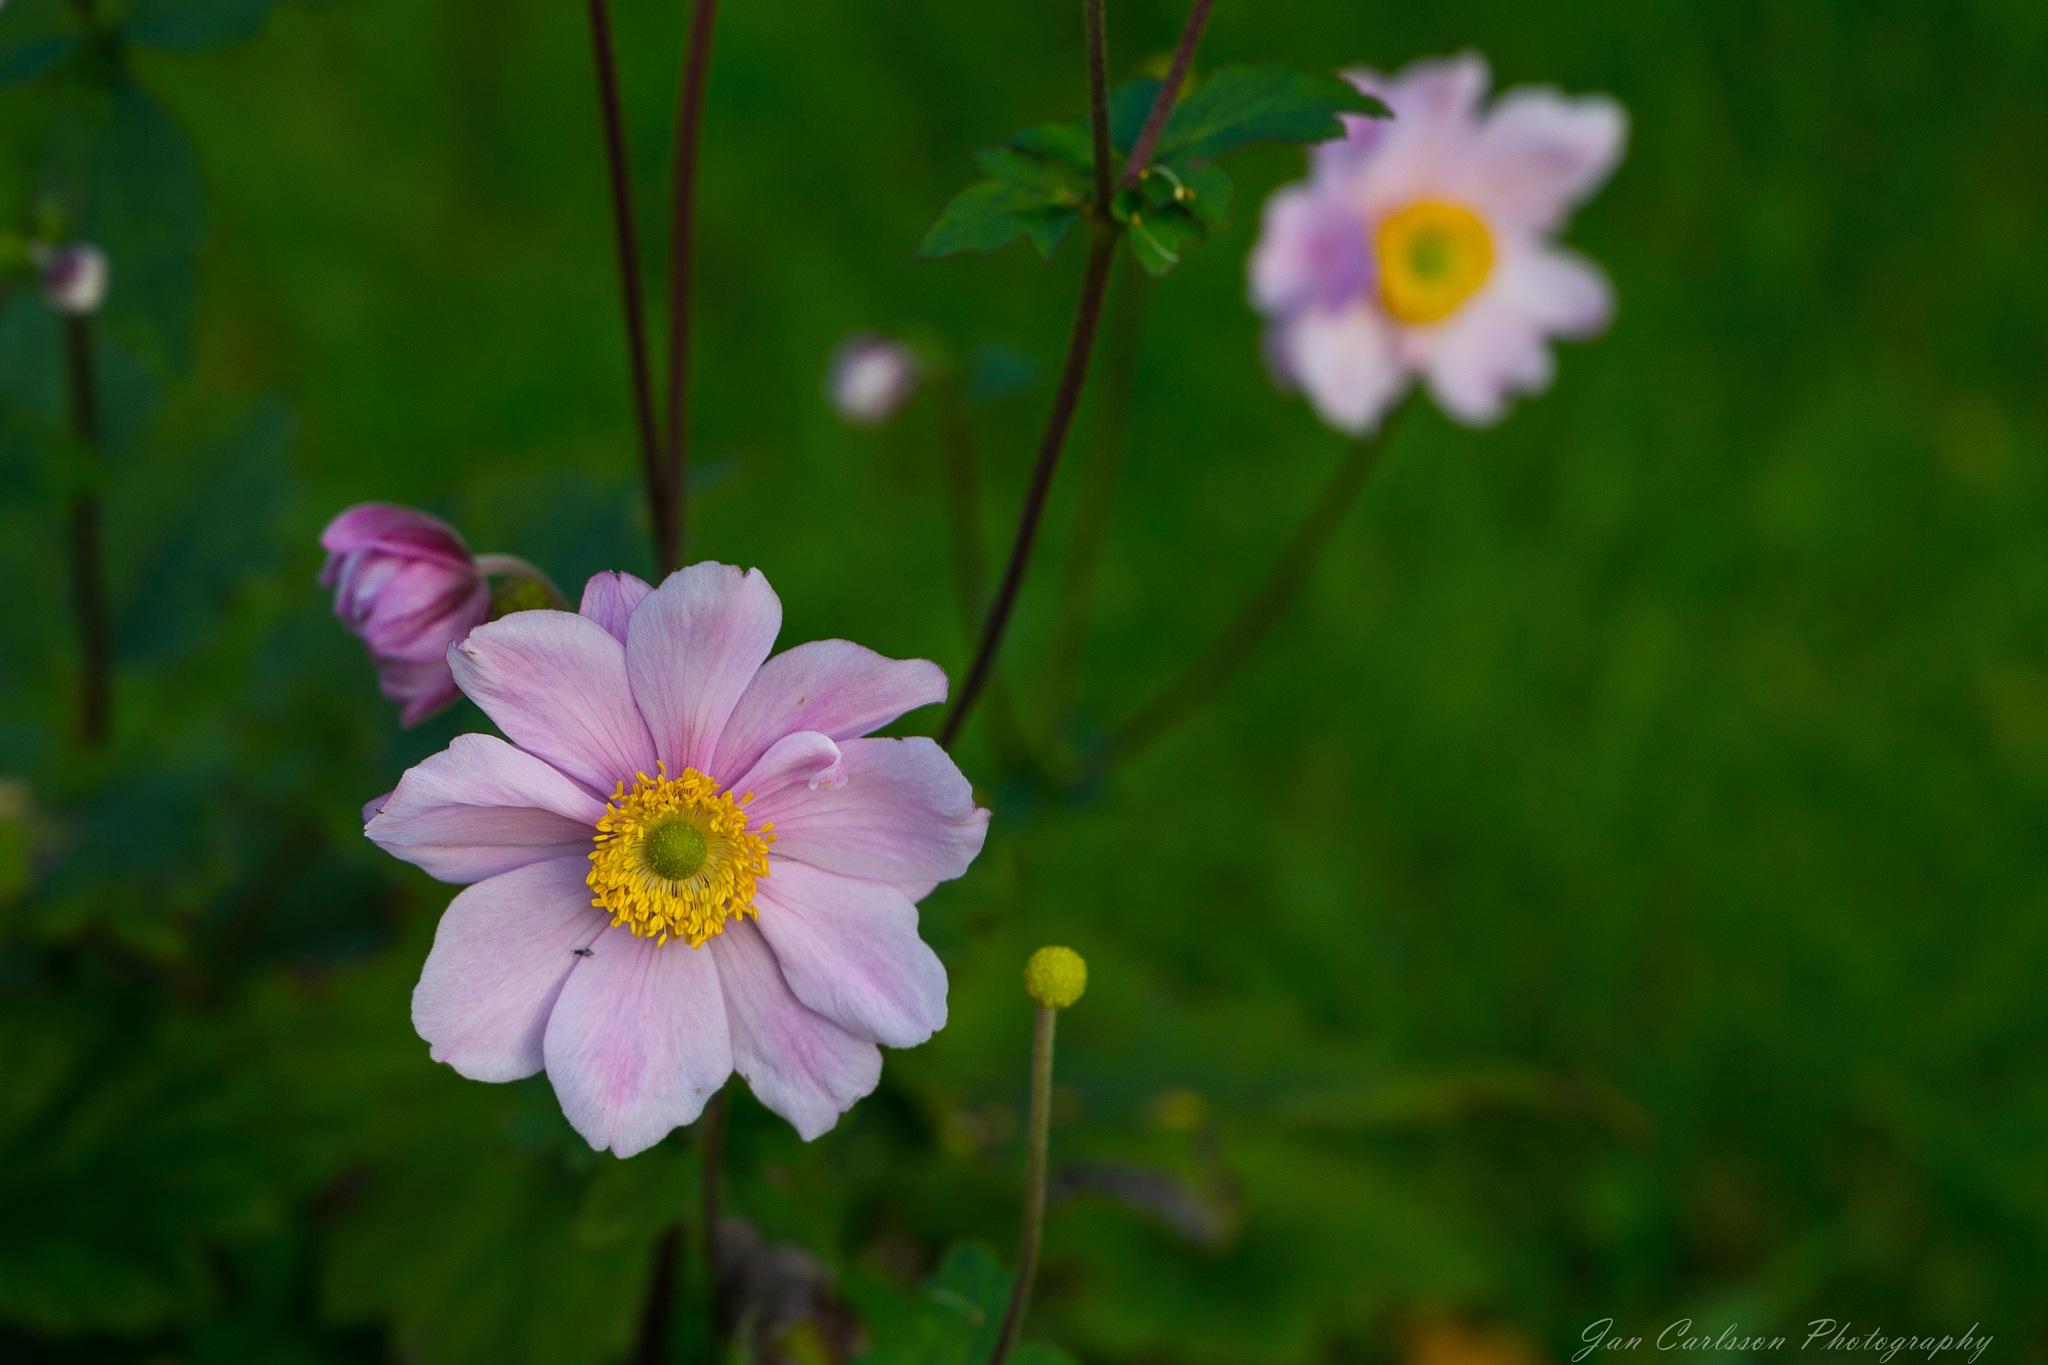 September Charm (Anemone hupehensis) by carljan w carlsson